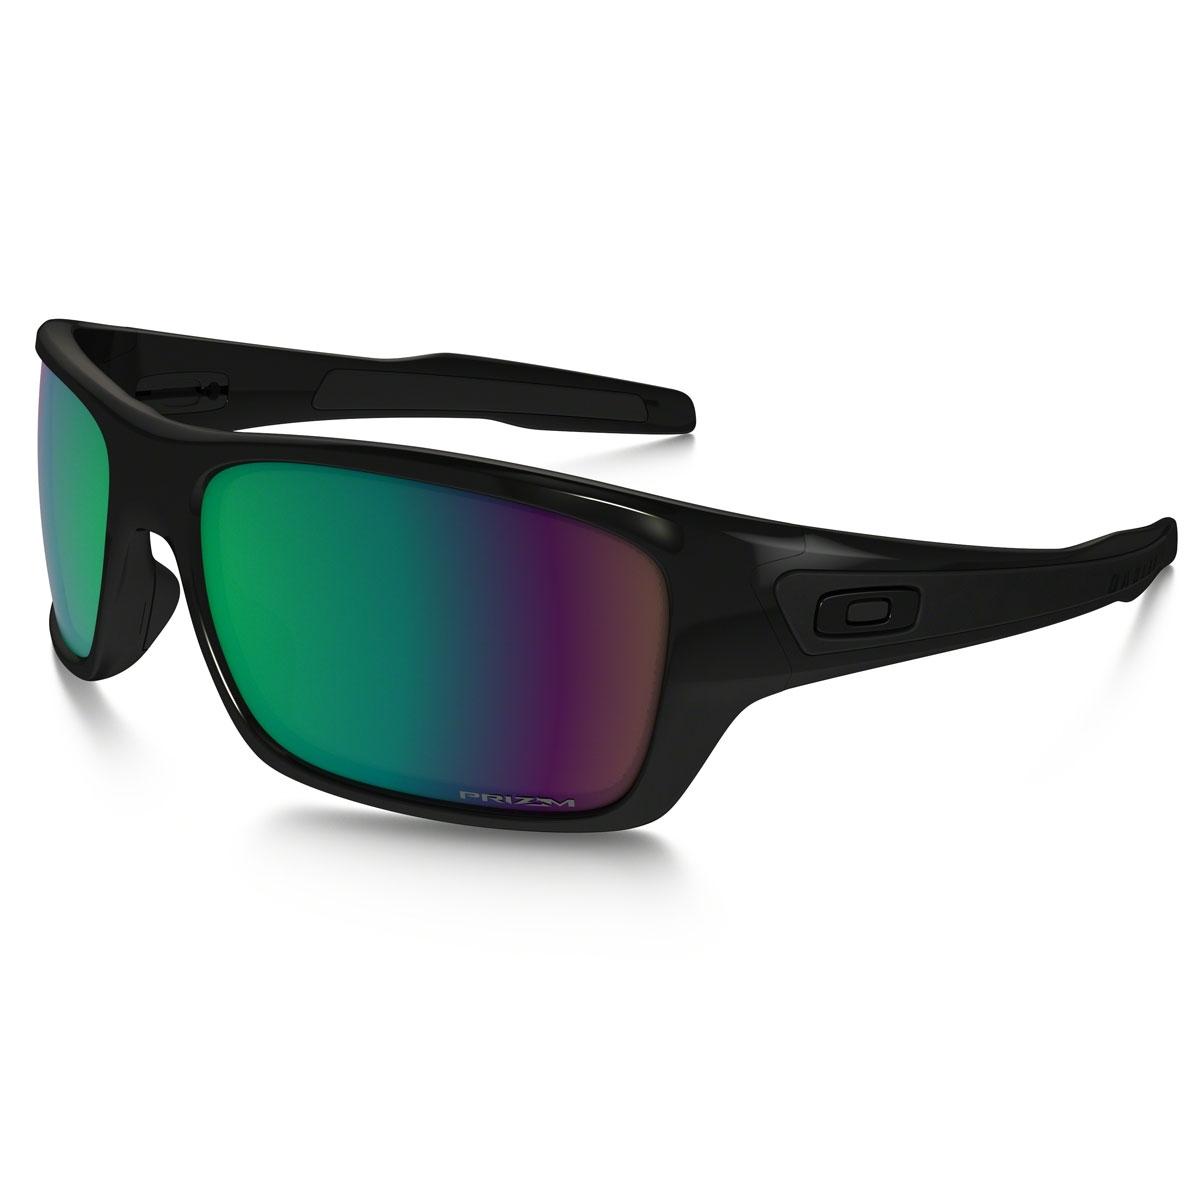 787d3ef014 Image of Oakley Turbine Sunglasses - Polished Black   Prizm Shallow Water  Polarized